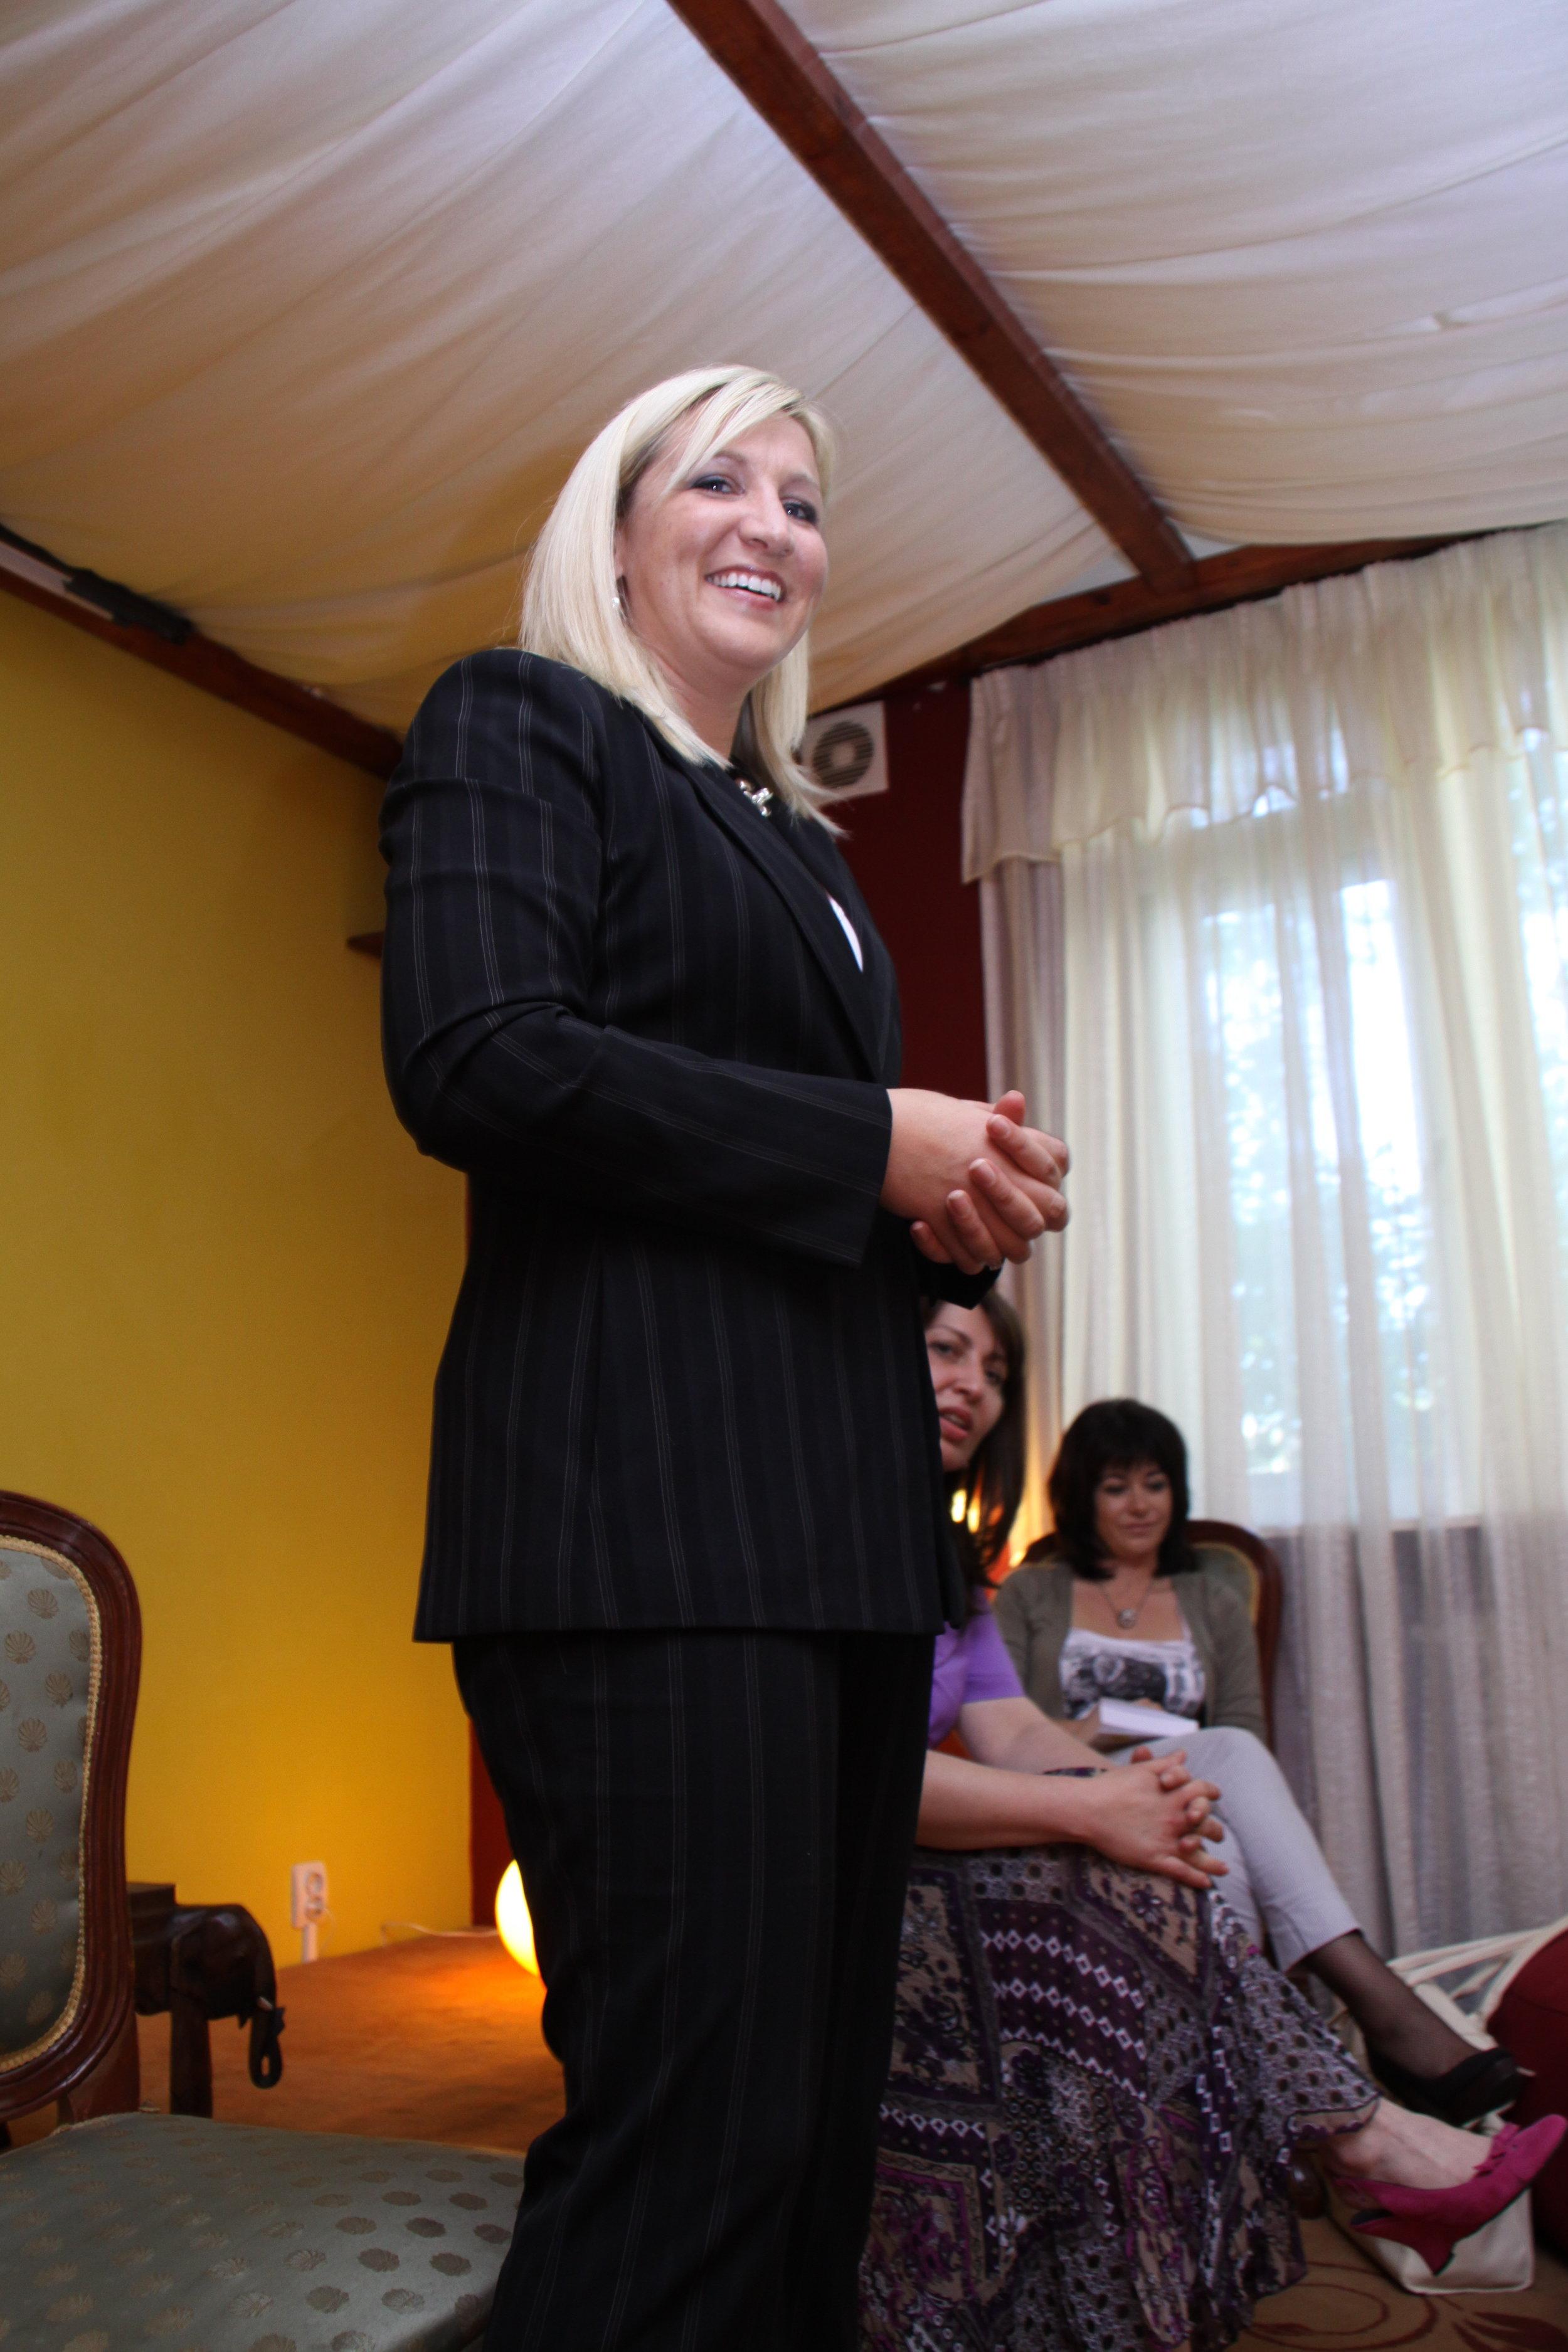 Tara giving a talk during a book launch in Romania